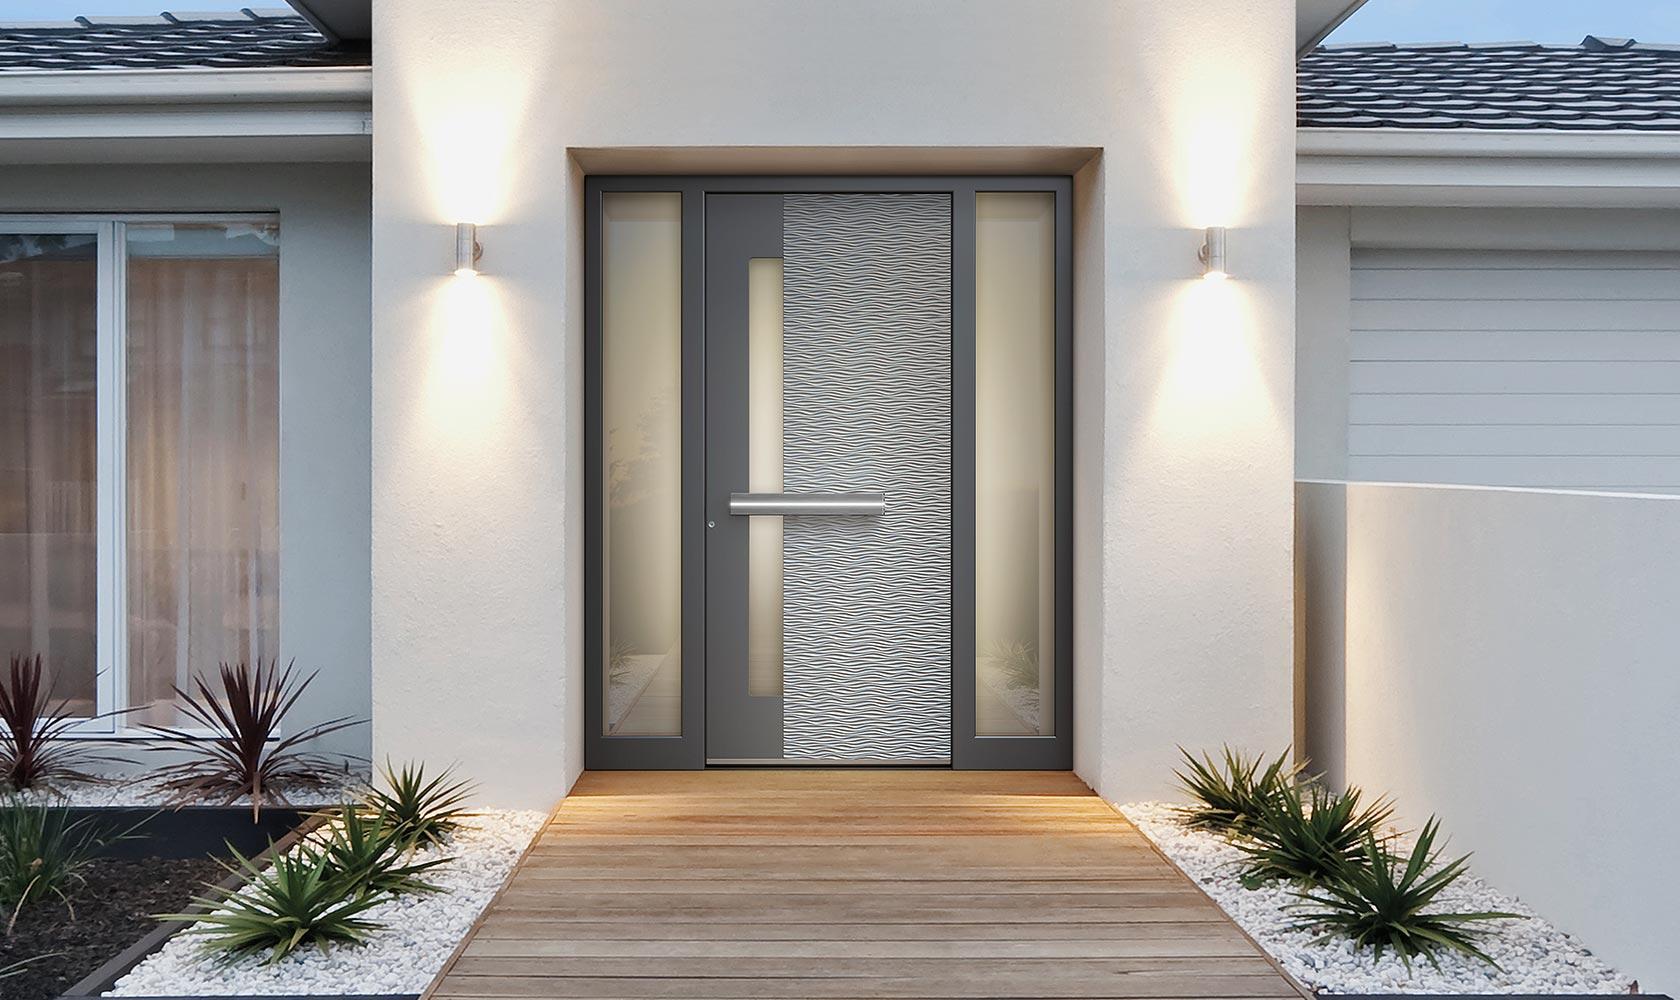 Pirnar Haustüren mit Design Oberfläche